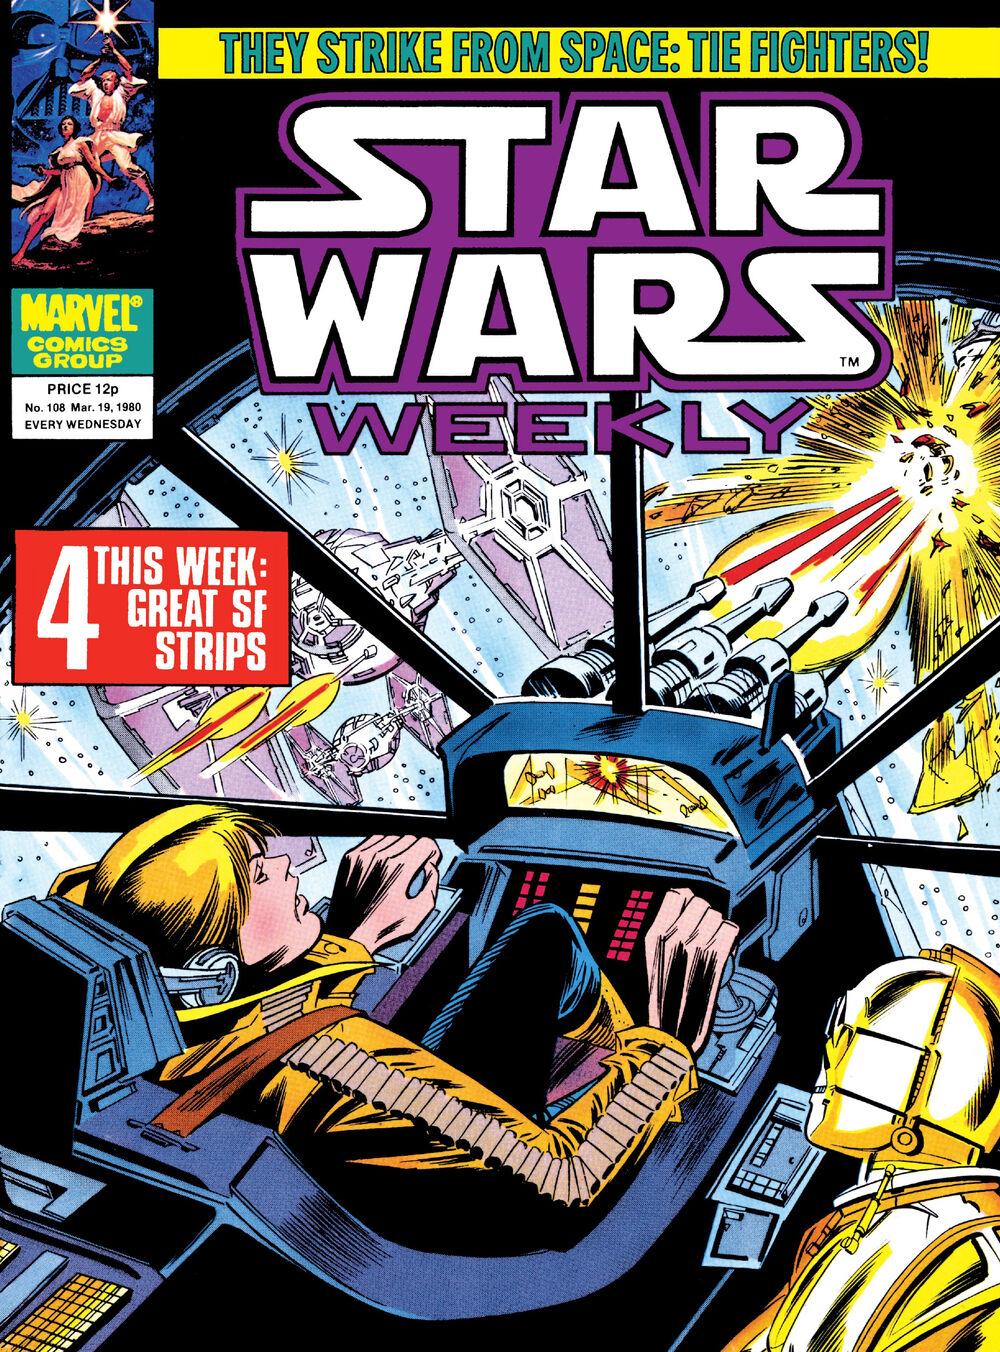 Star Wars Weekly 108